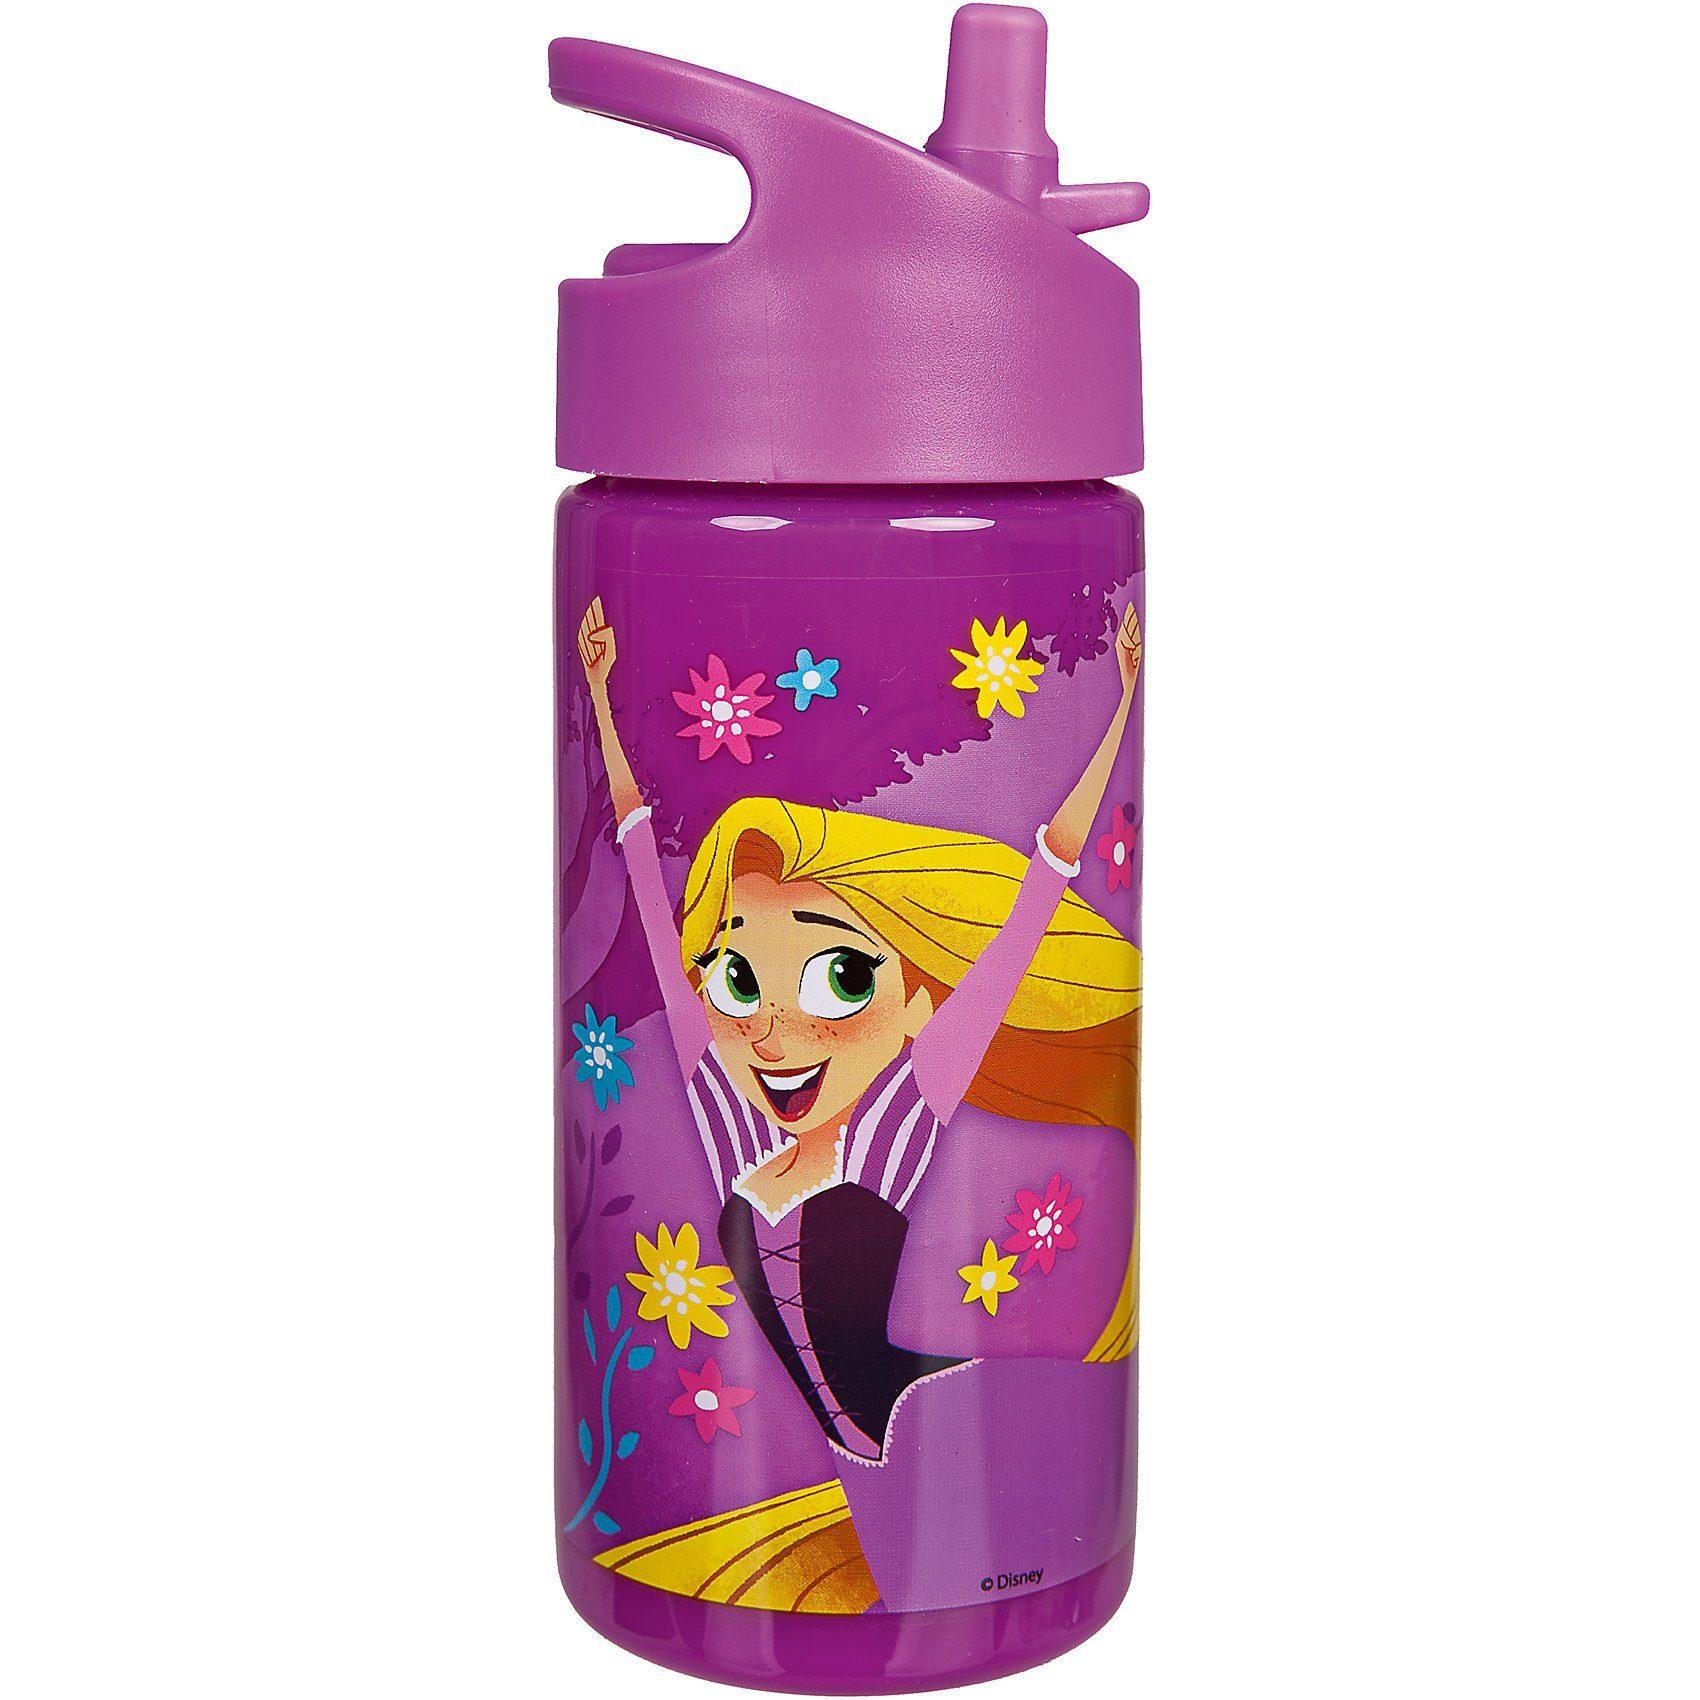 Scooli Aero-Trinkflasche Rapunzel, 400 ml